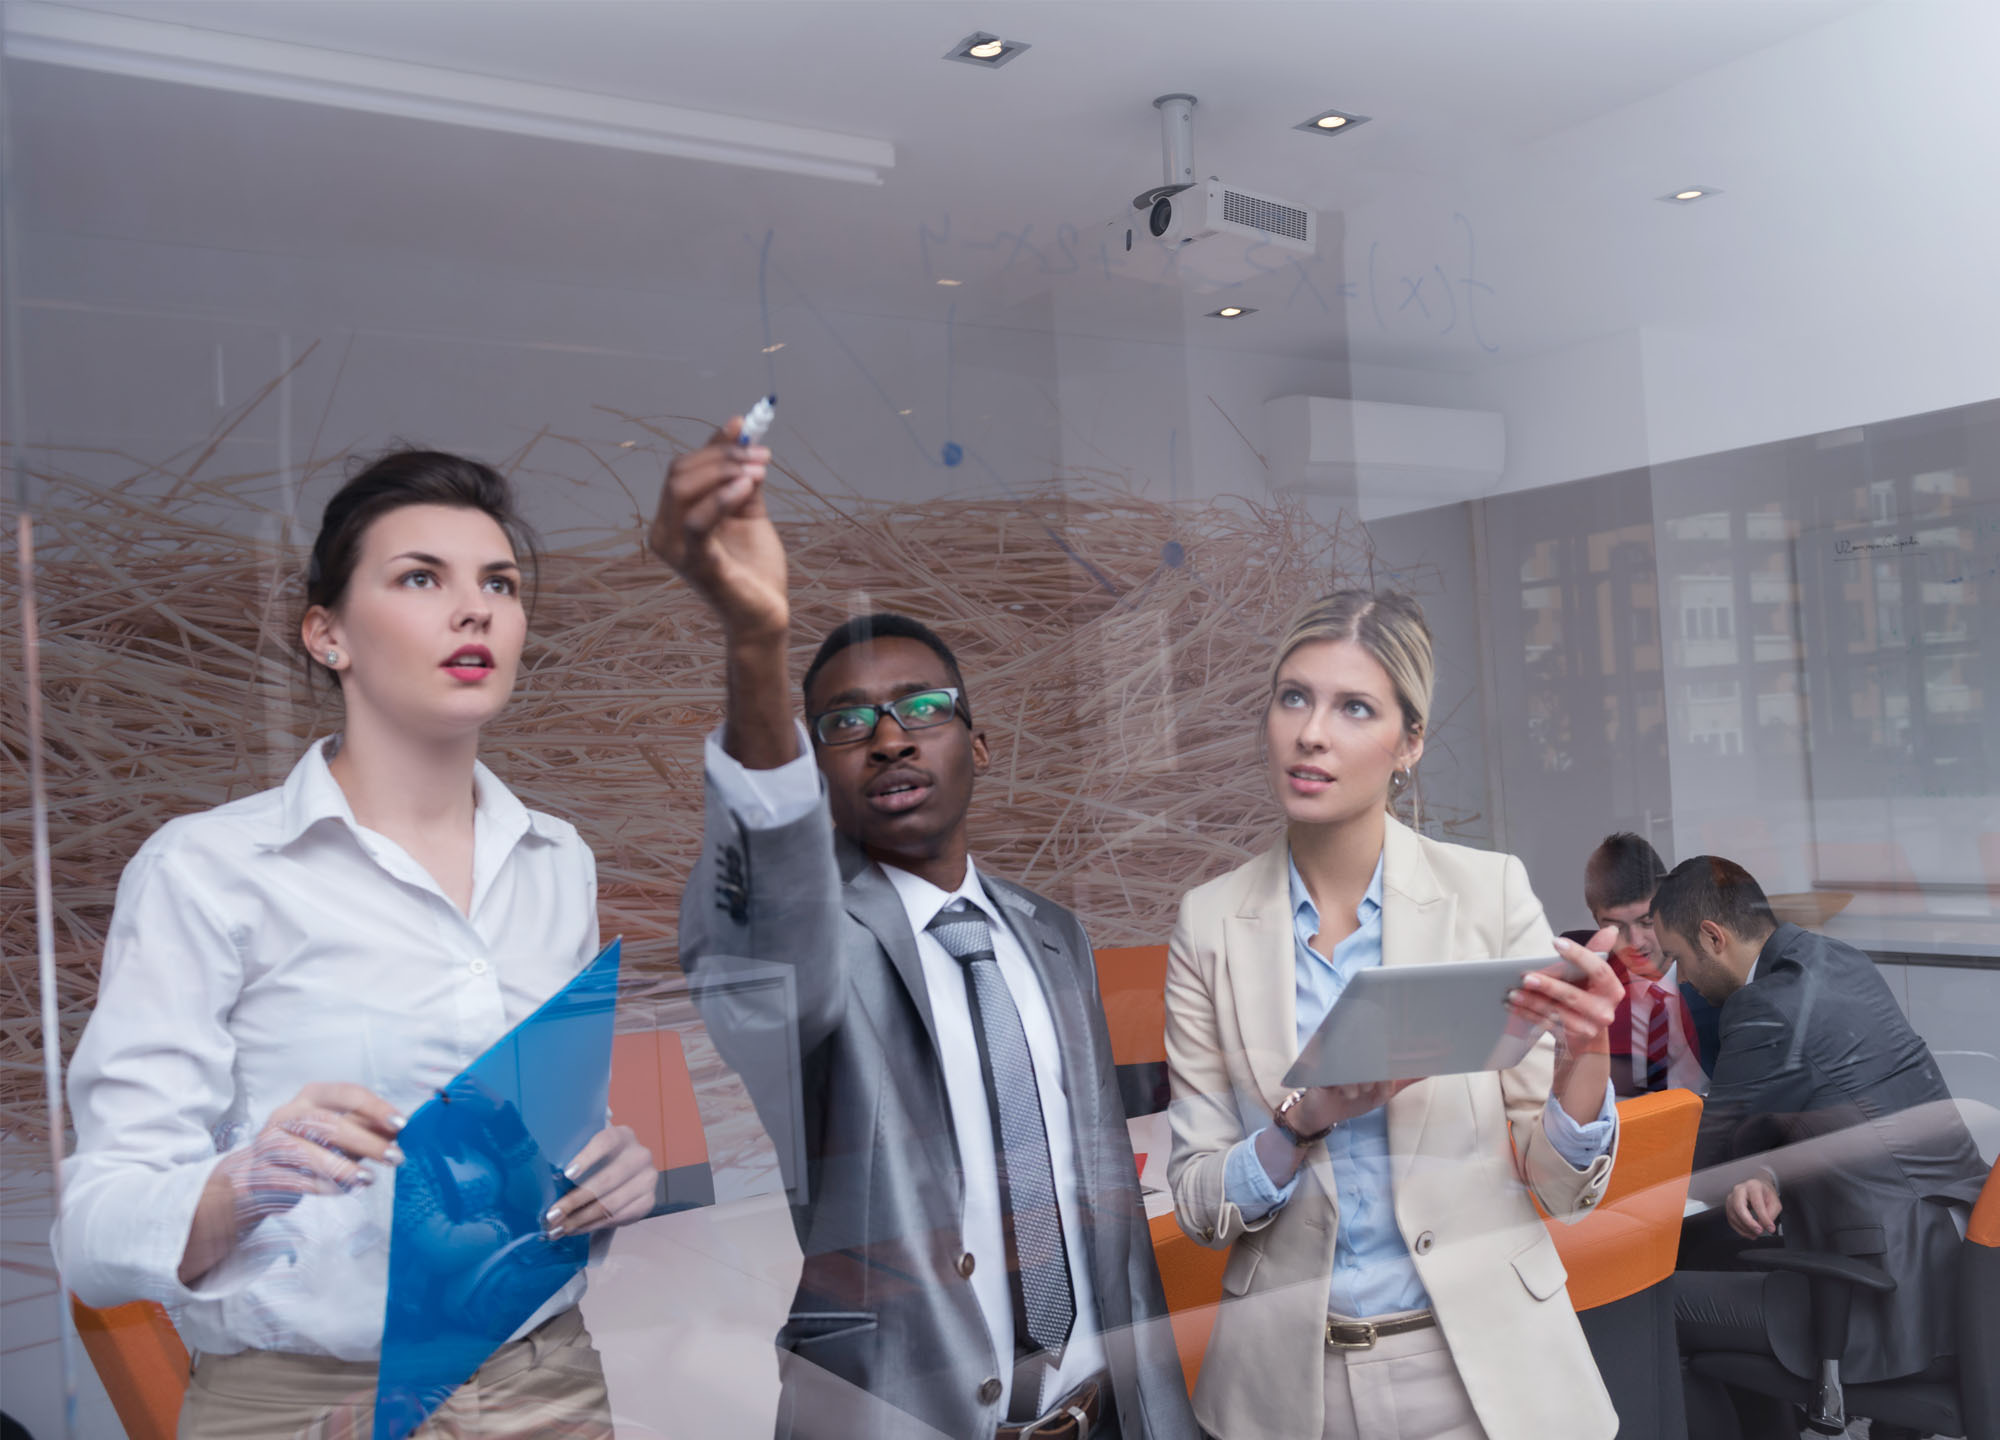 Developing your ledership style